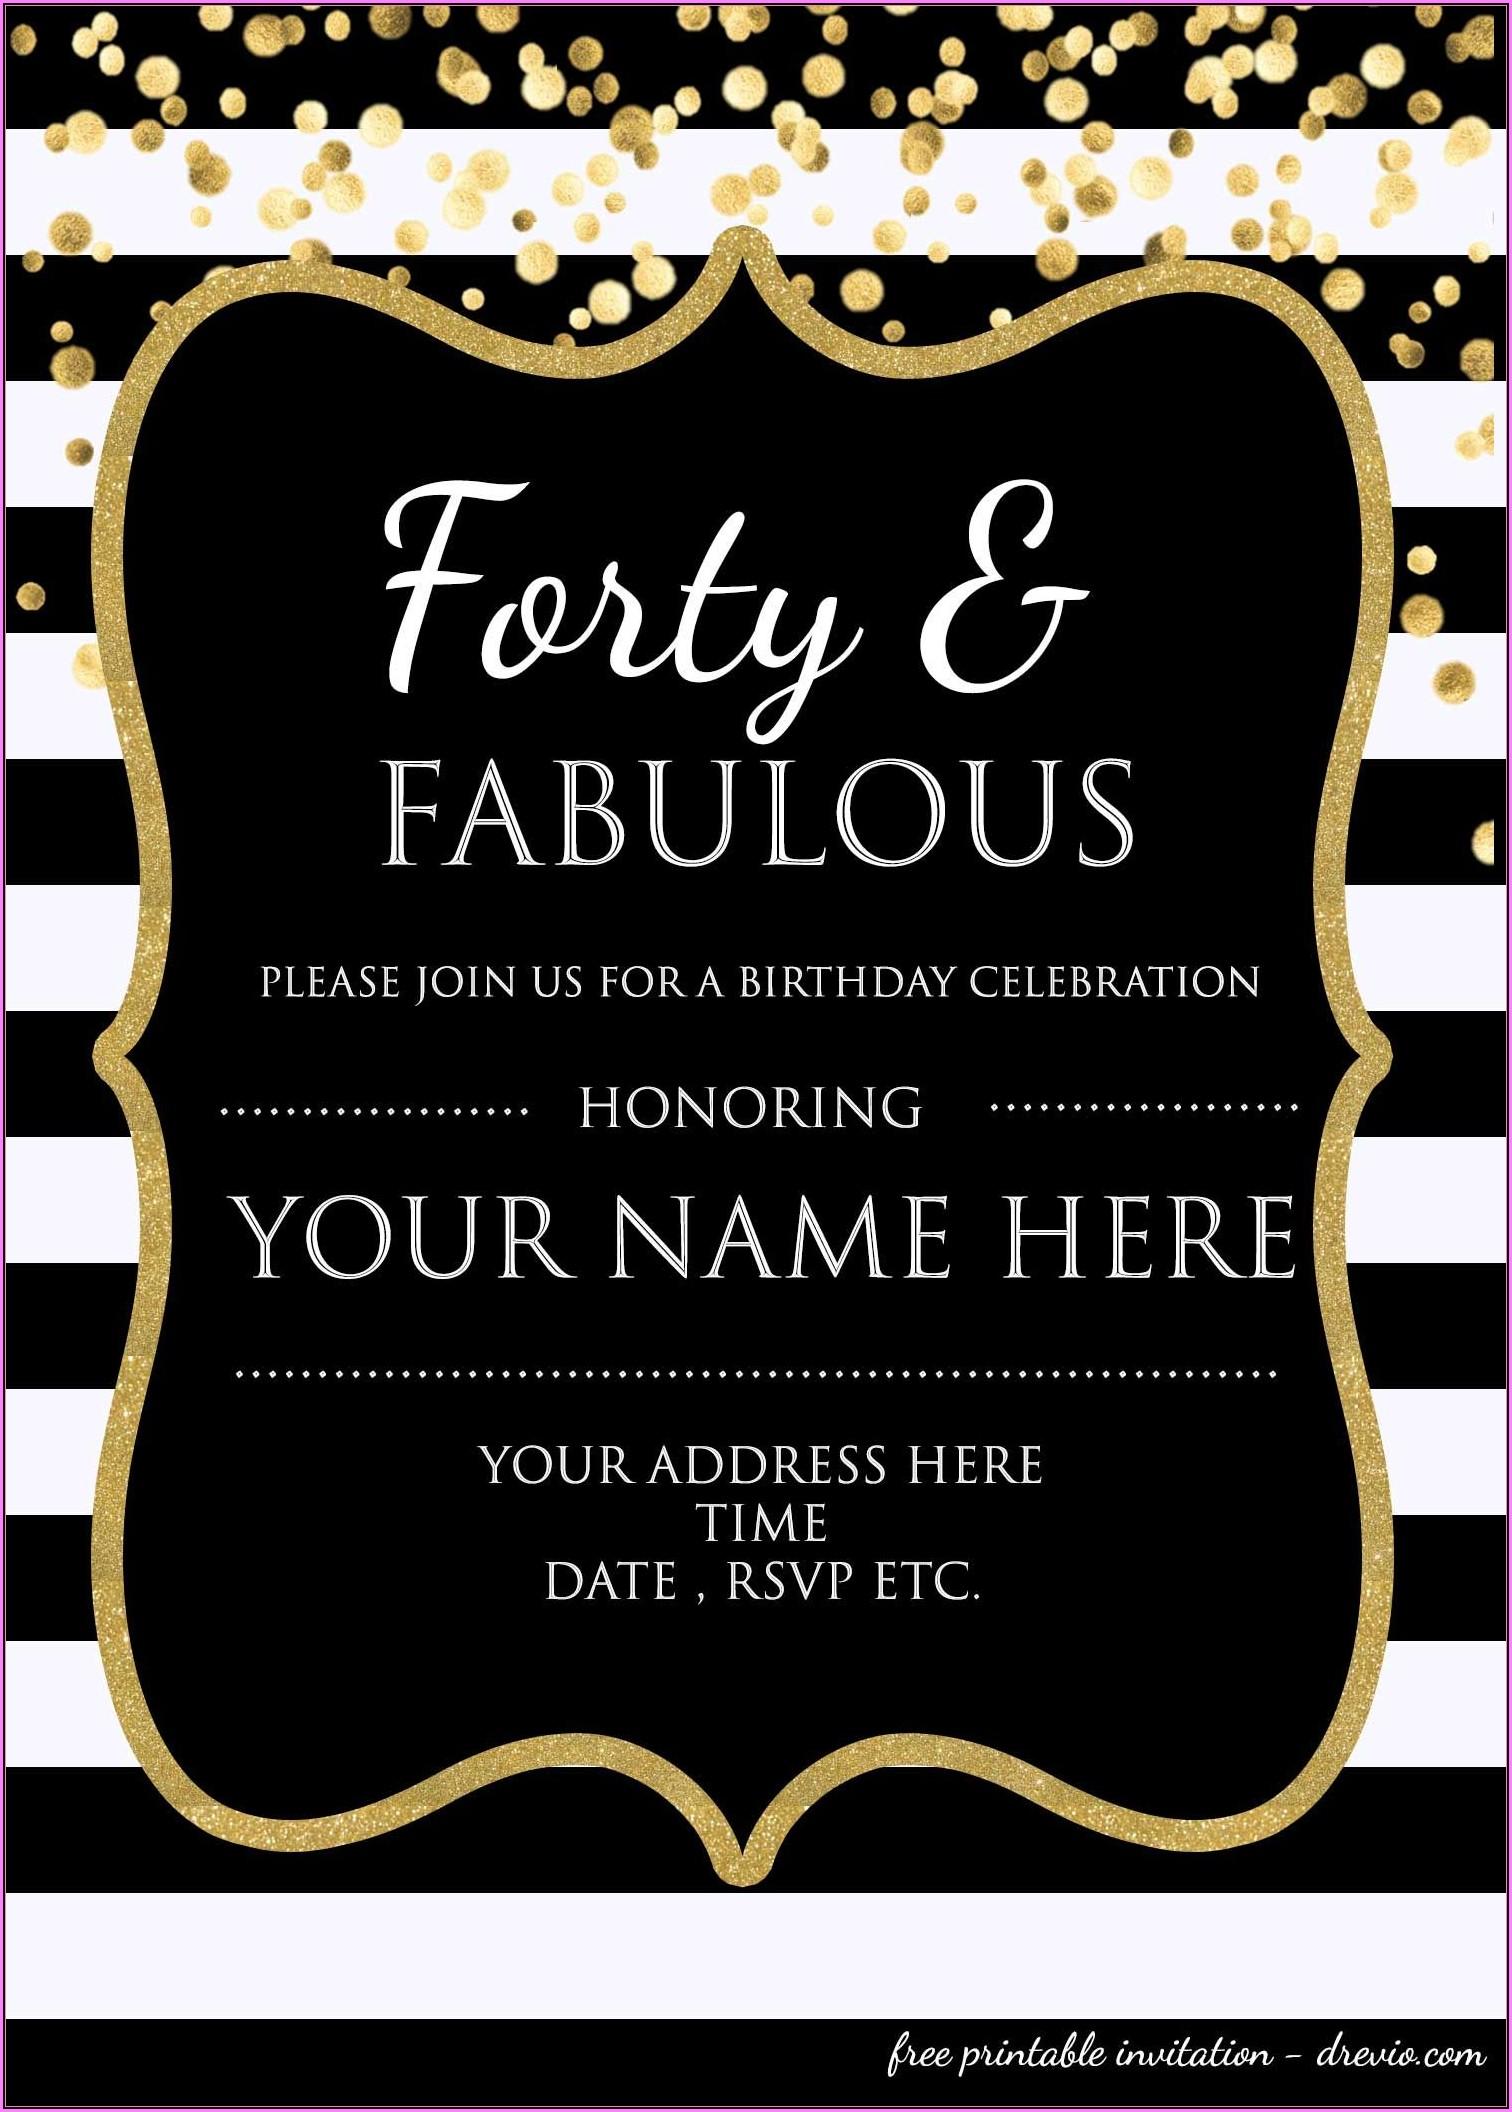 Invitation Templates Free Download Birthday